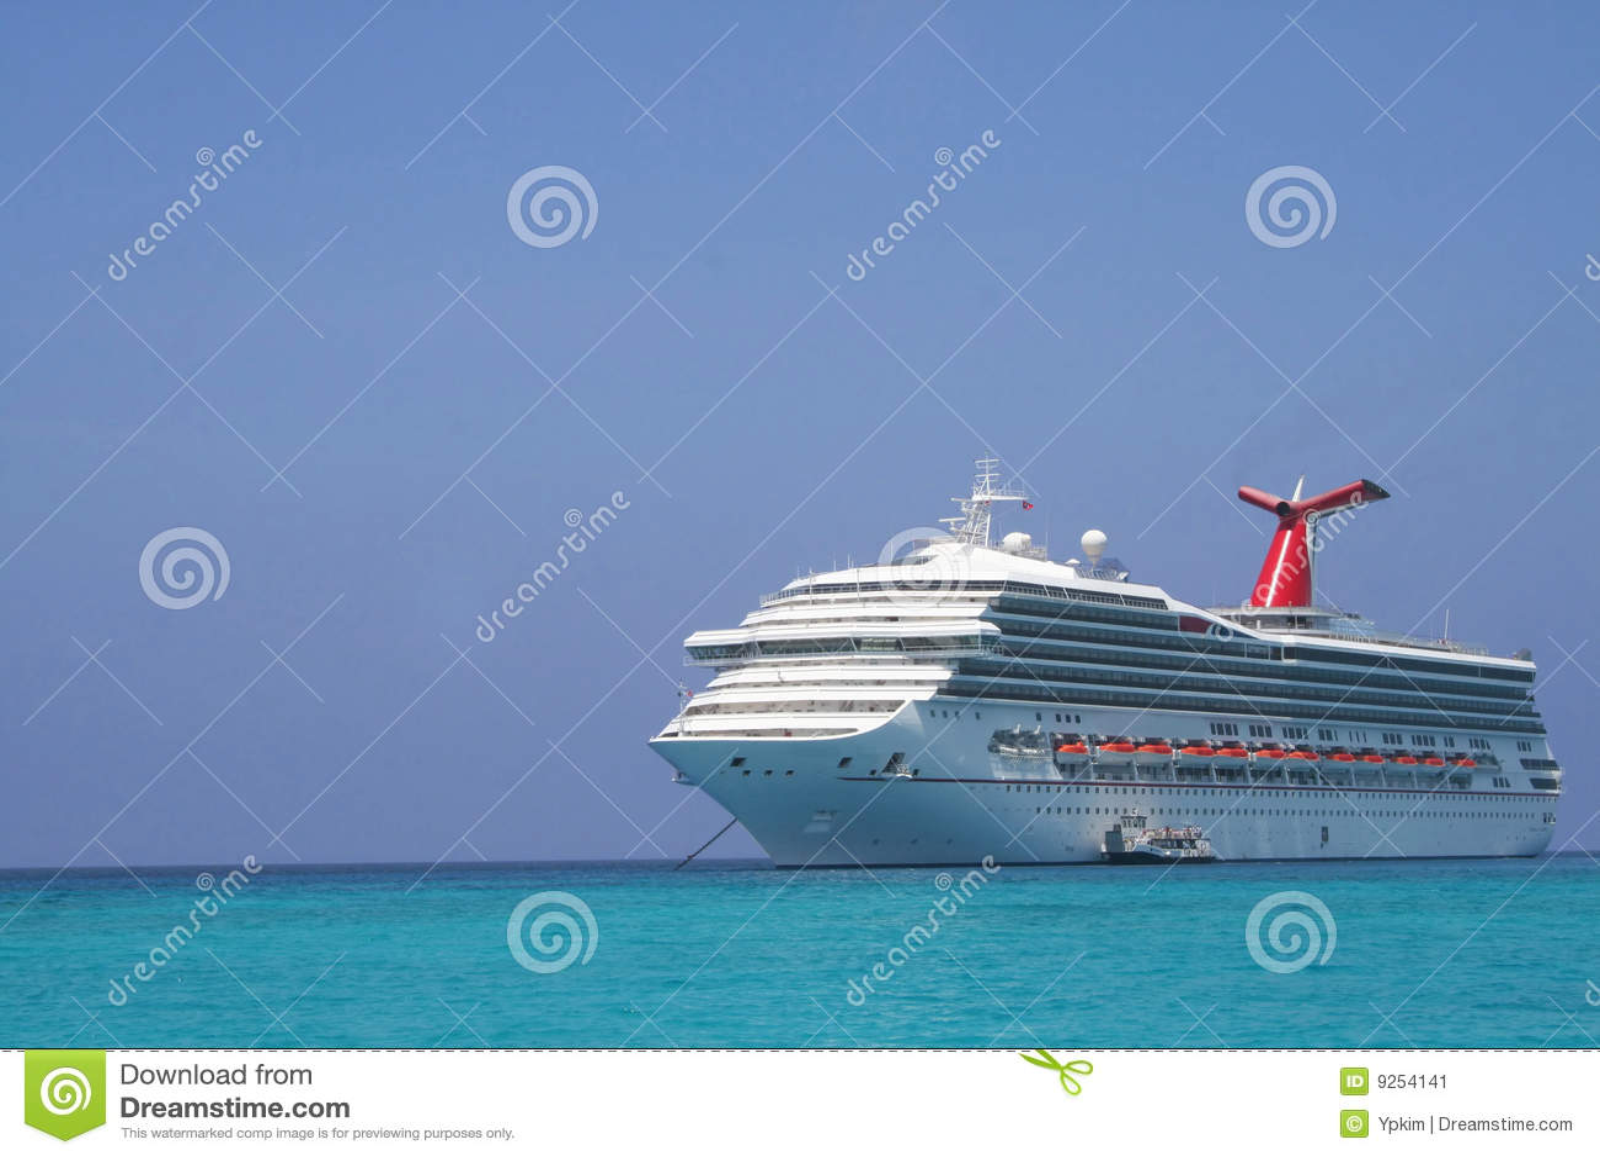 Download Cruise Ship stock image. Image of caribbean, boat, beautiful - 9254141